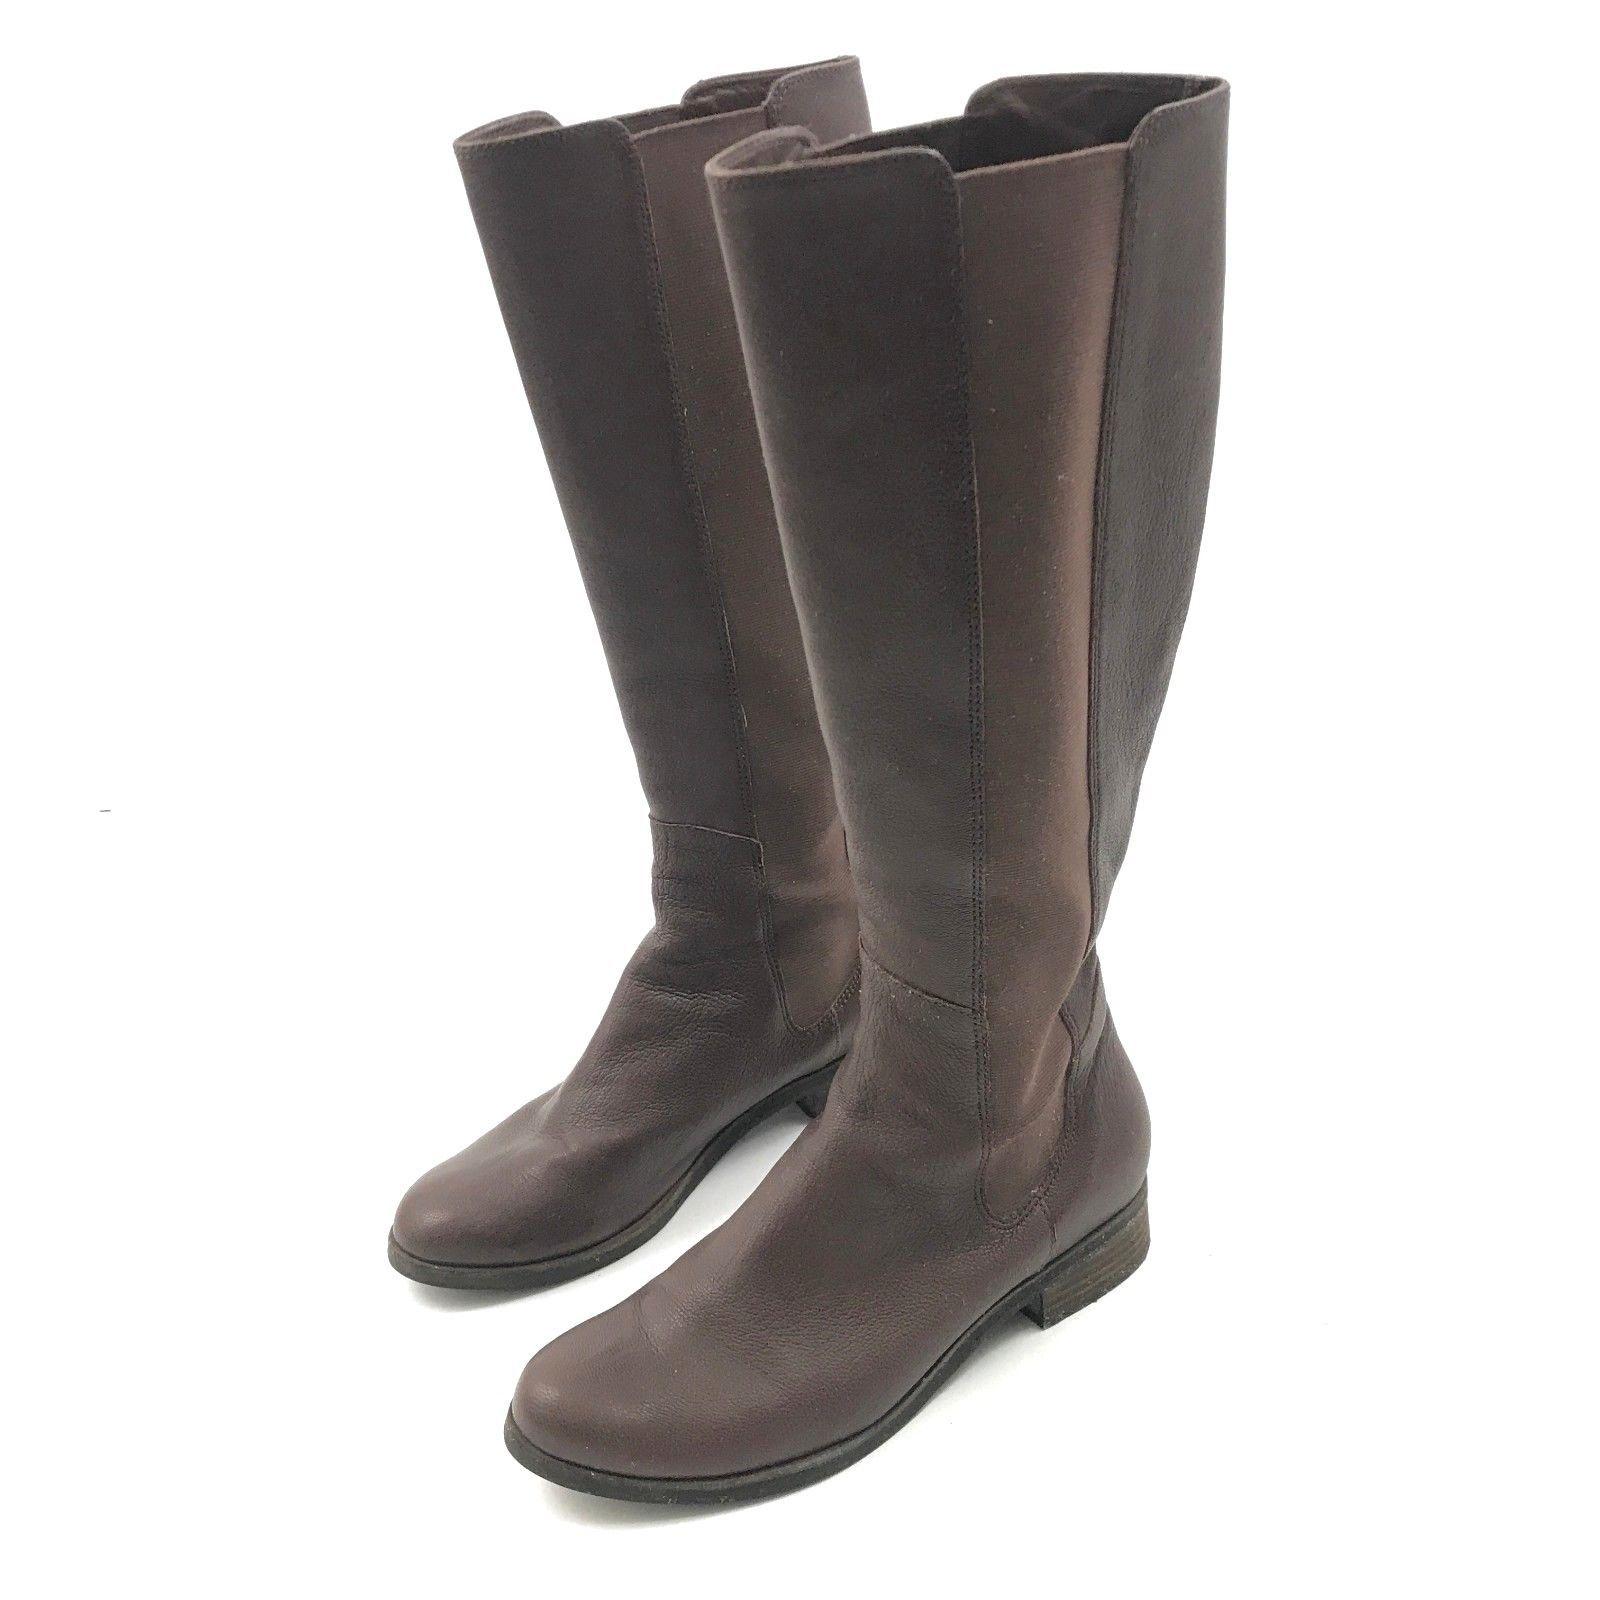 bd48c4ade7d7 Cole Haan Nike Air Boot. In stock 57. Cole HAAN Bottes Hauteur Genou Femme  9.5 B Cuir Brun Extensible Côtés Talon -  54.51